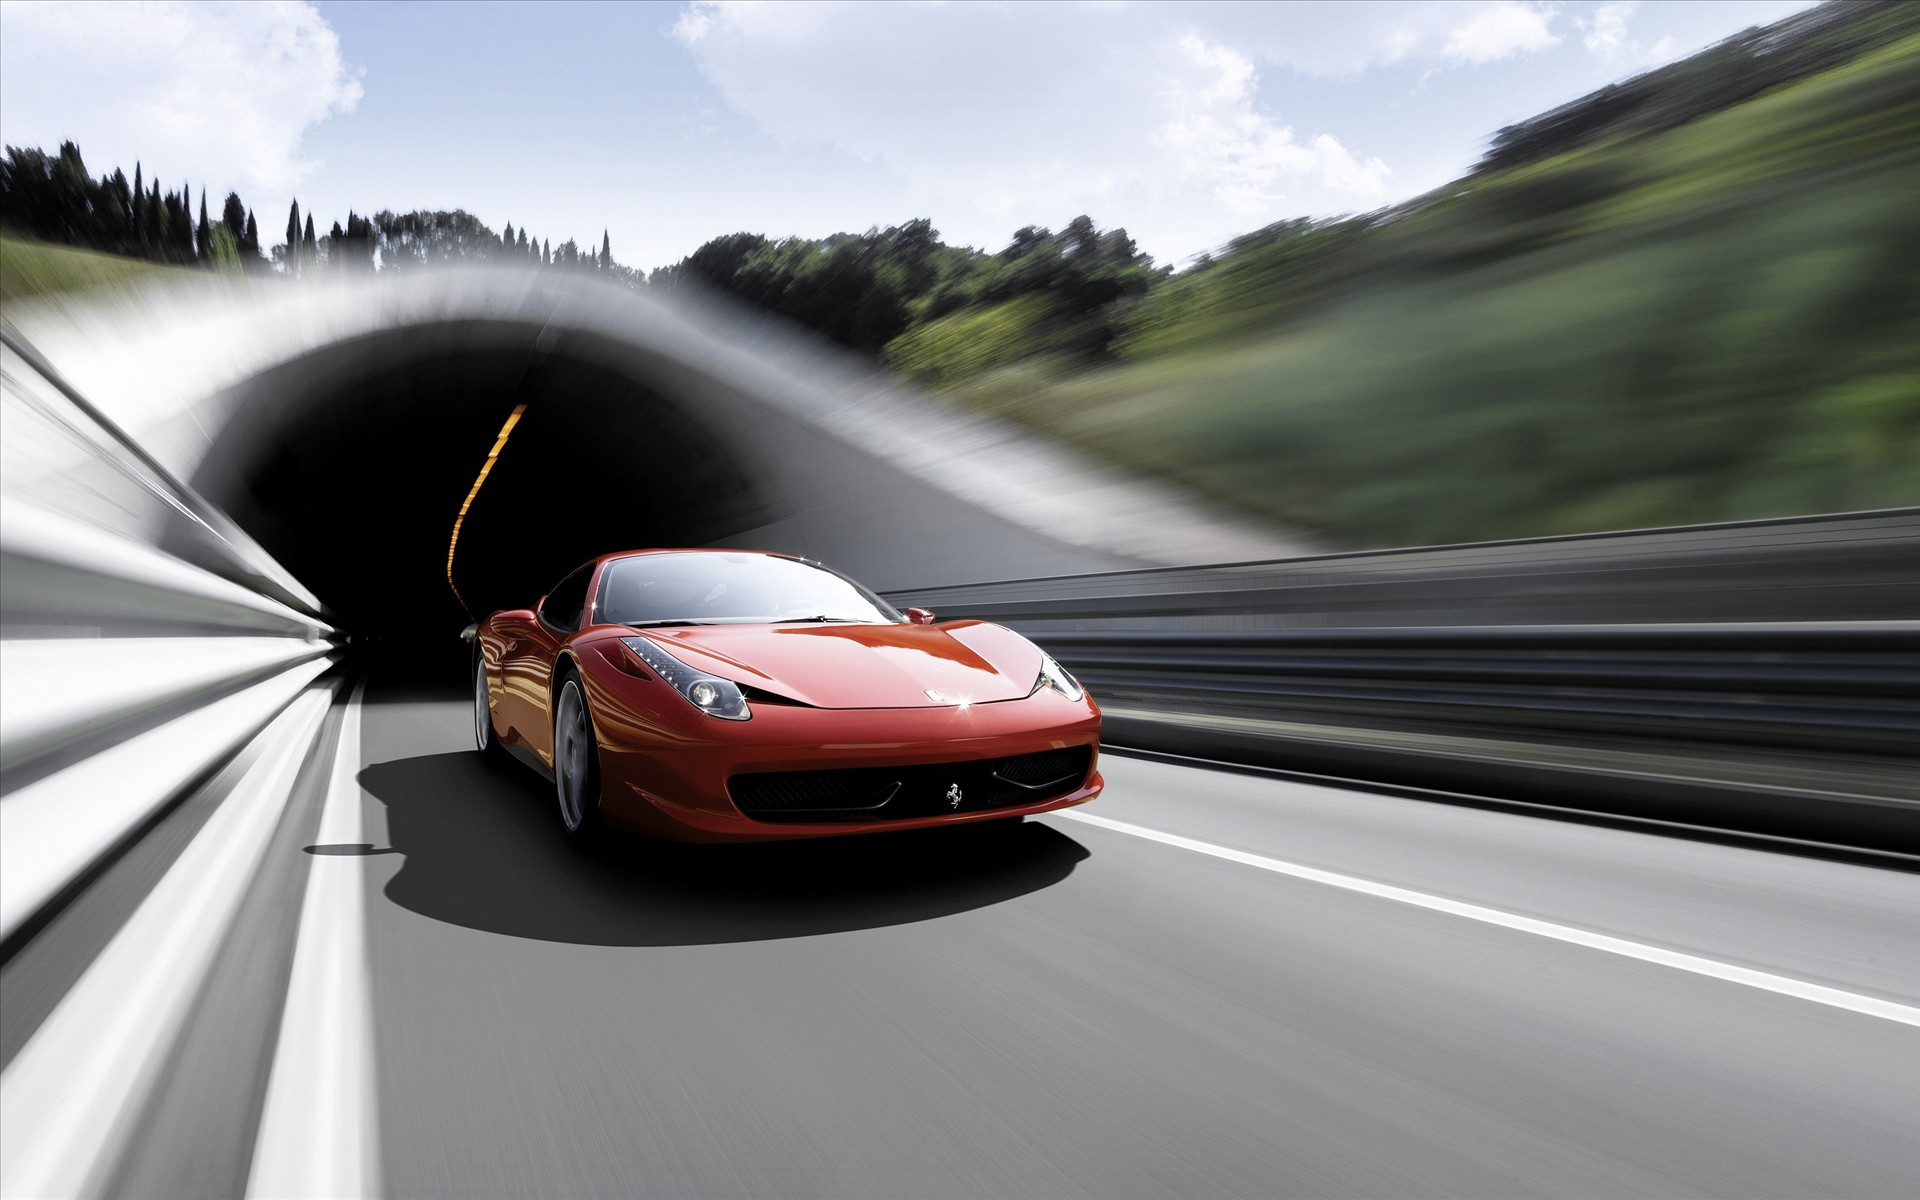 Ferrari 458 Italia Supercar 4 Wallpapers HD Wallpapers 1920x1200